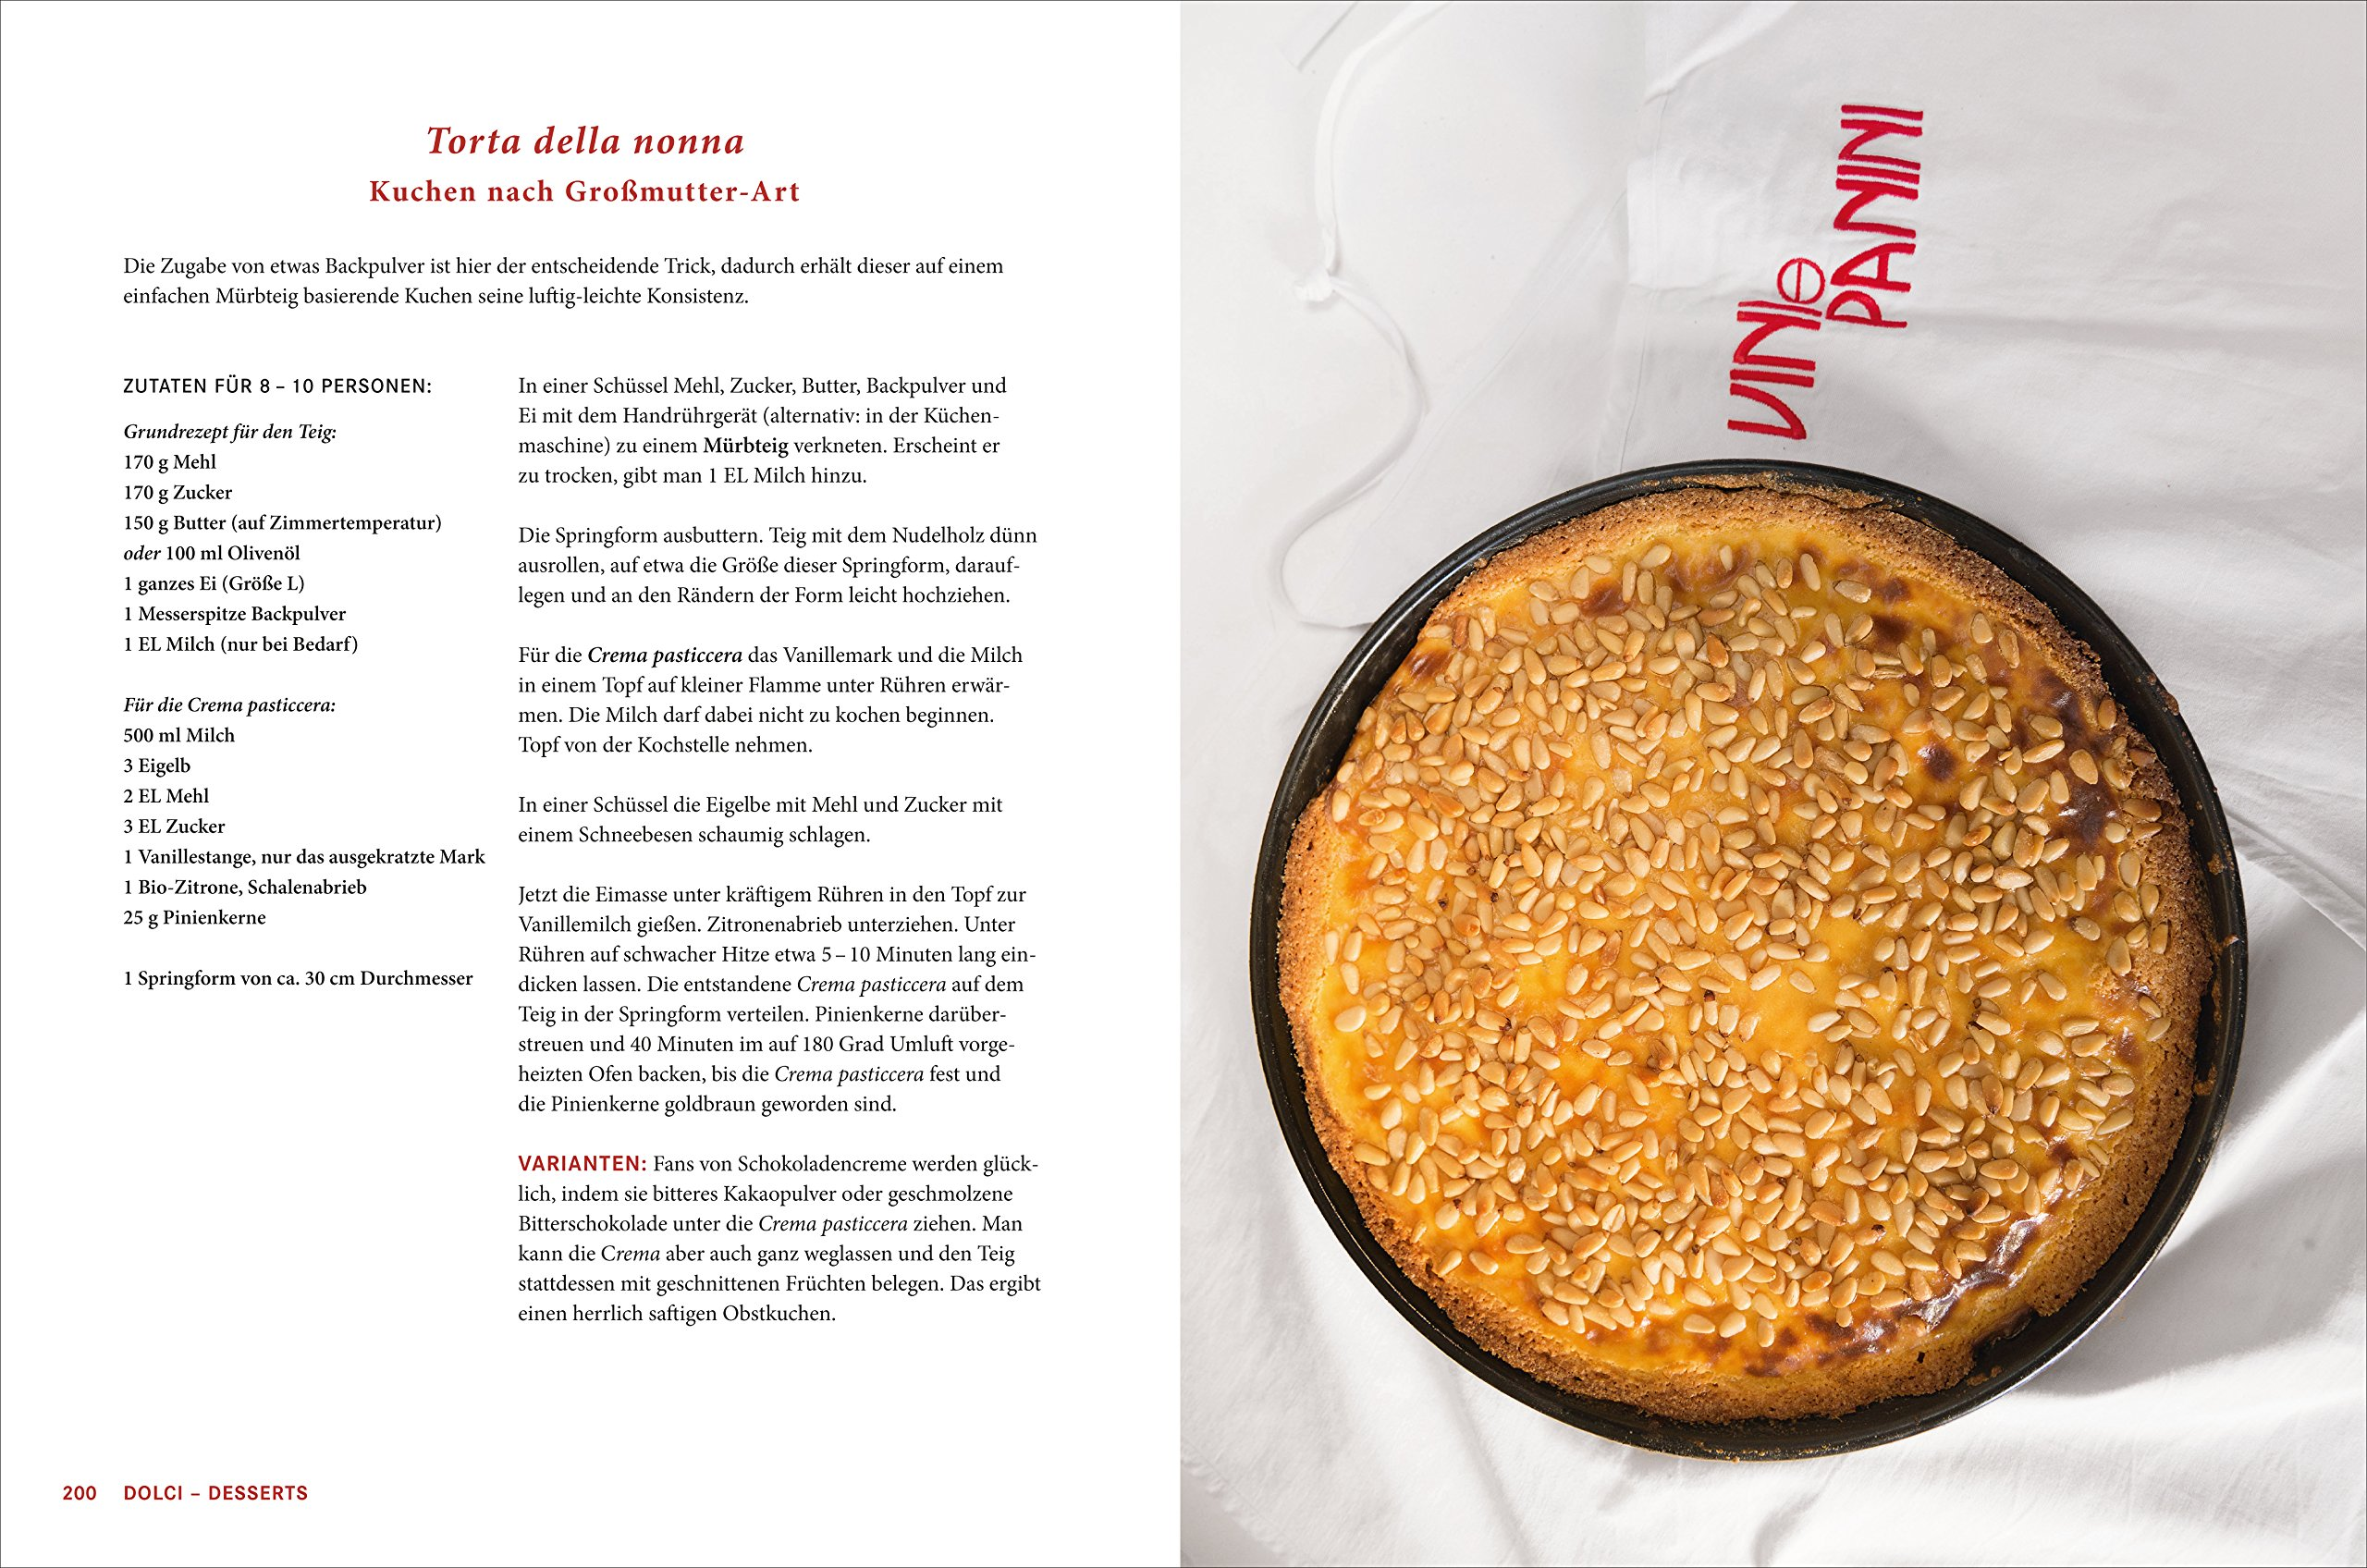 Semplice!: Meine einfache italienische Küche: Amazon.de: Andrea ...